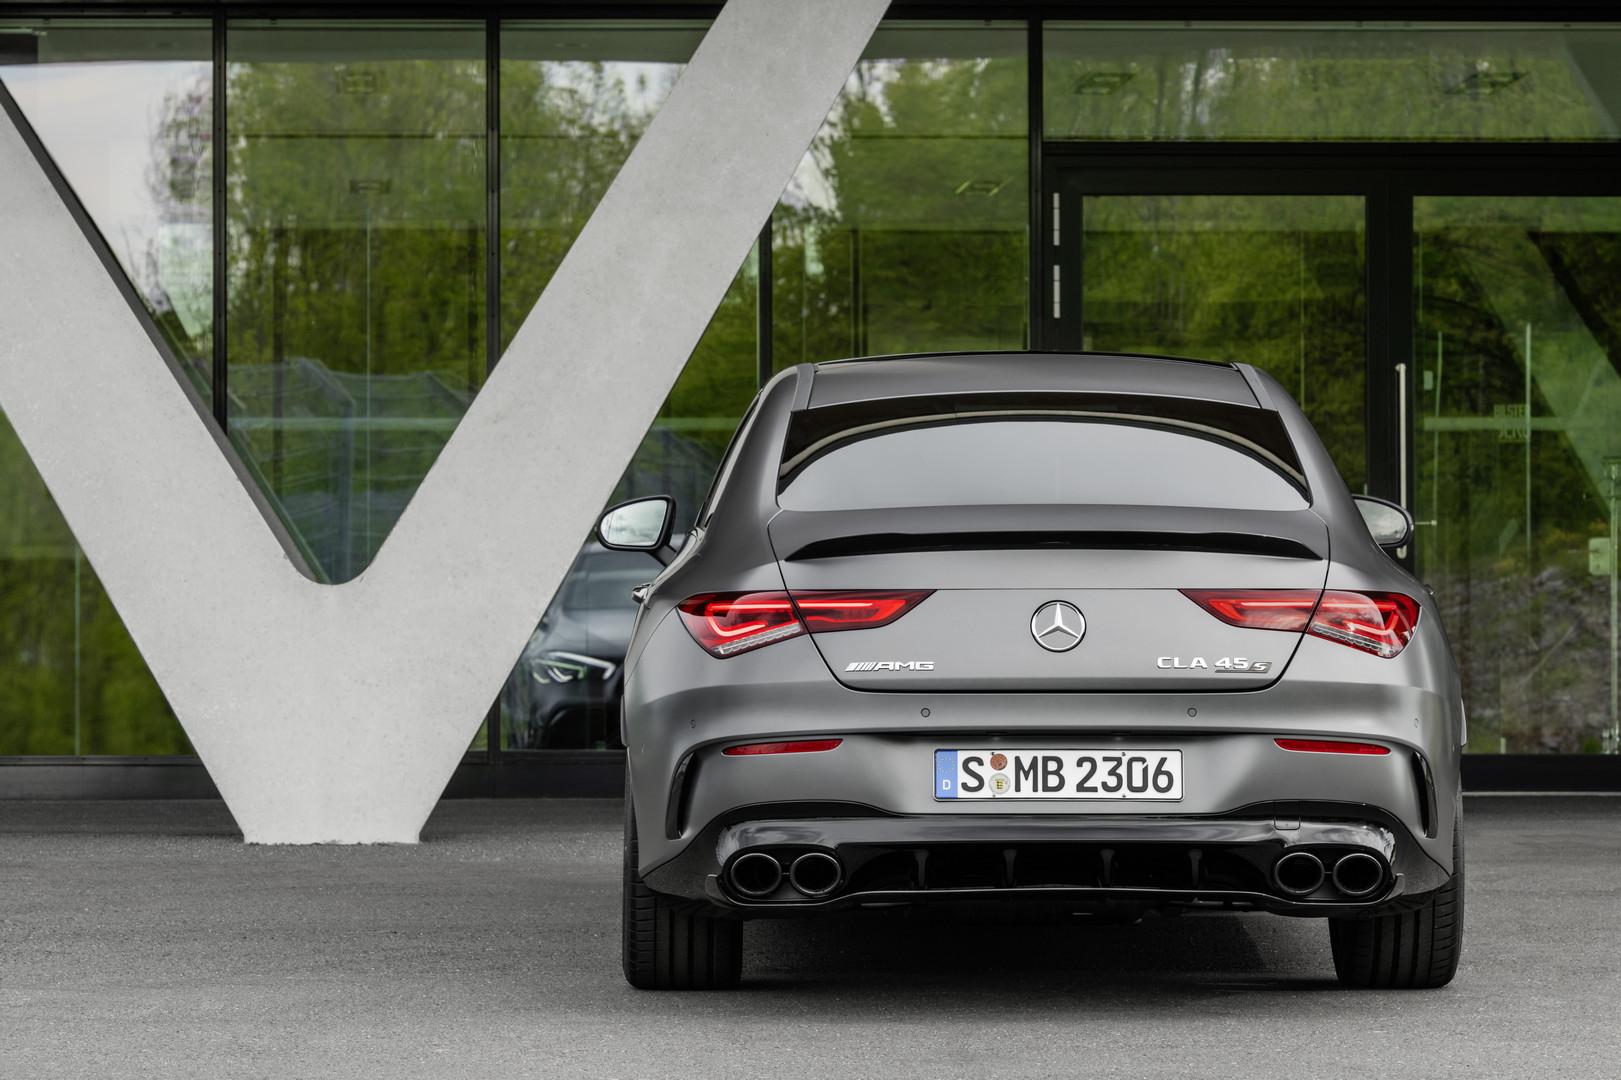 2020 Mercedes-AMG CLA 45 S Rear Lights